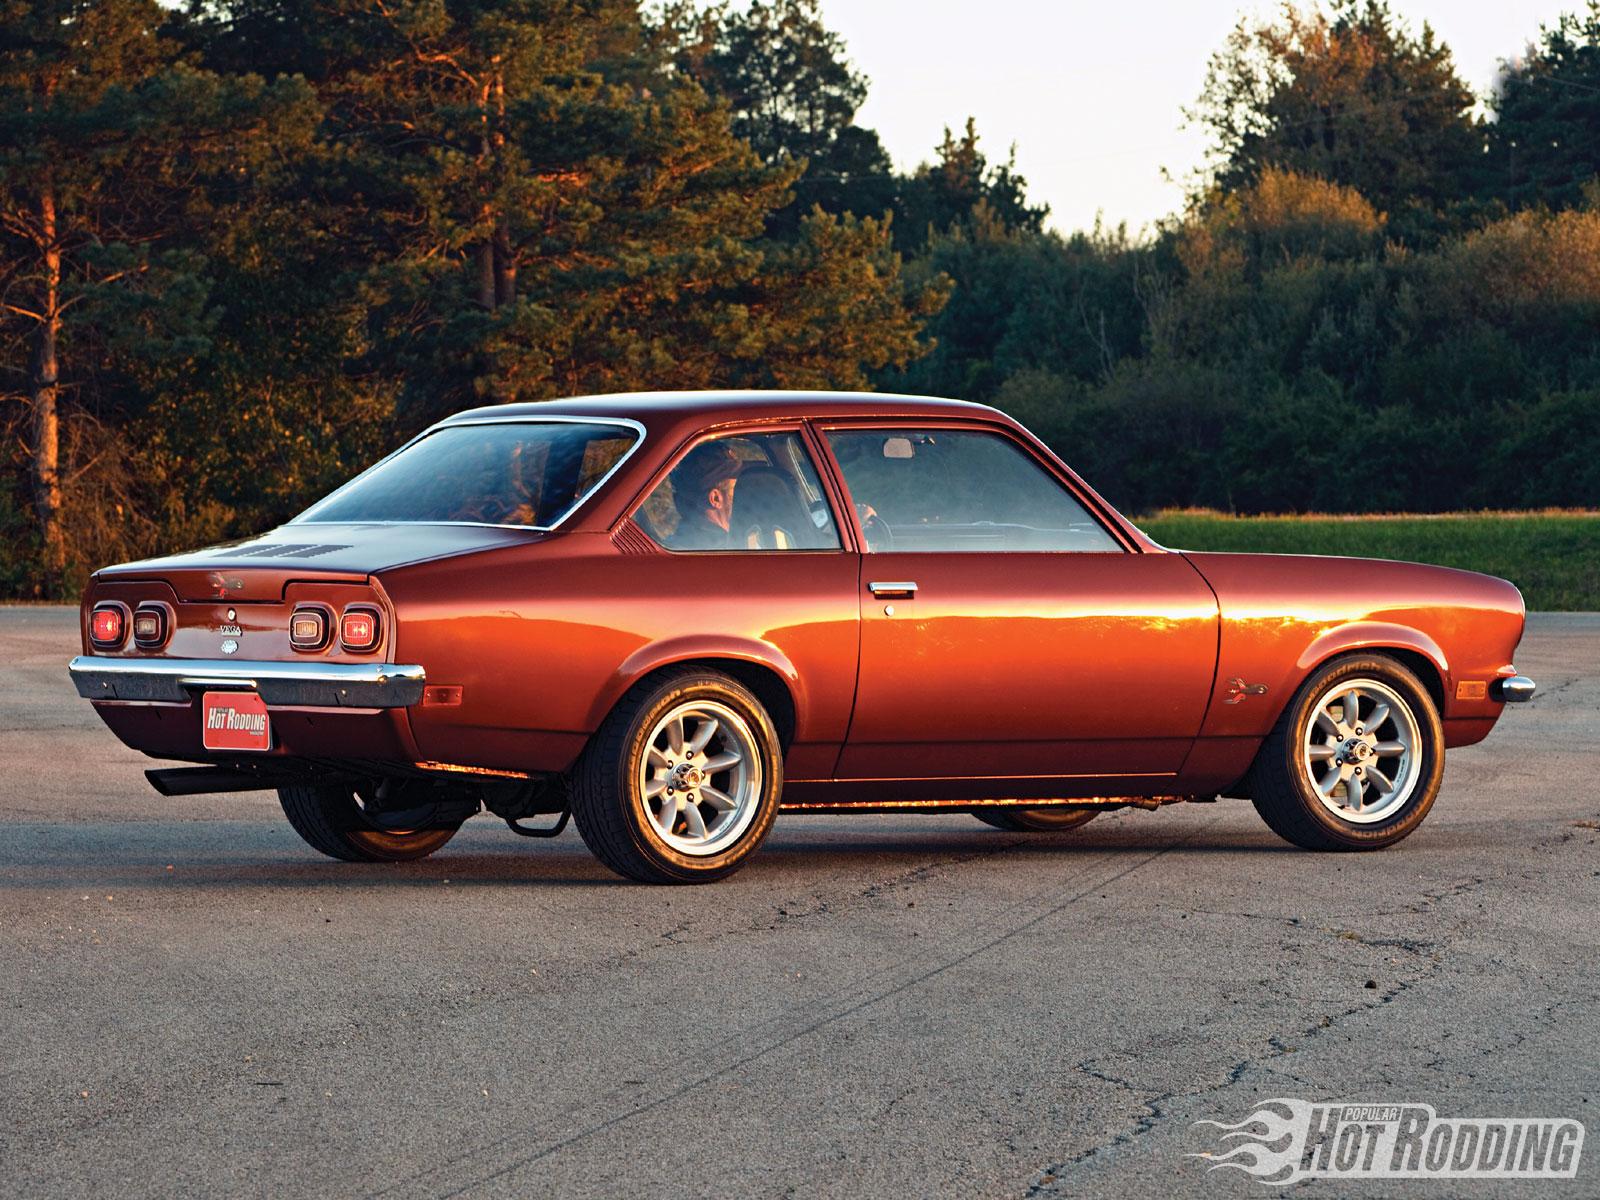 1972 Chevy Vega hot rod custom muscle cars x wallpaper 1600x1200 1600x1200